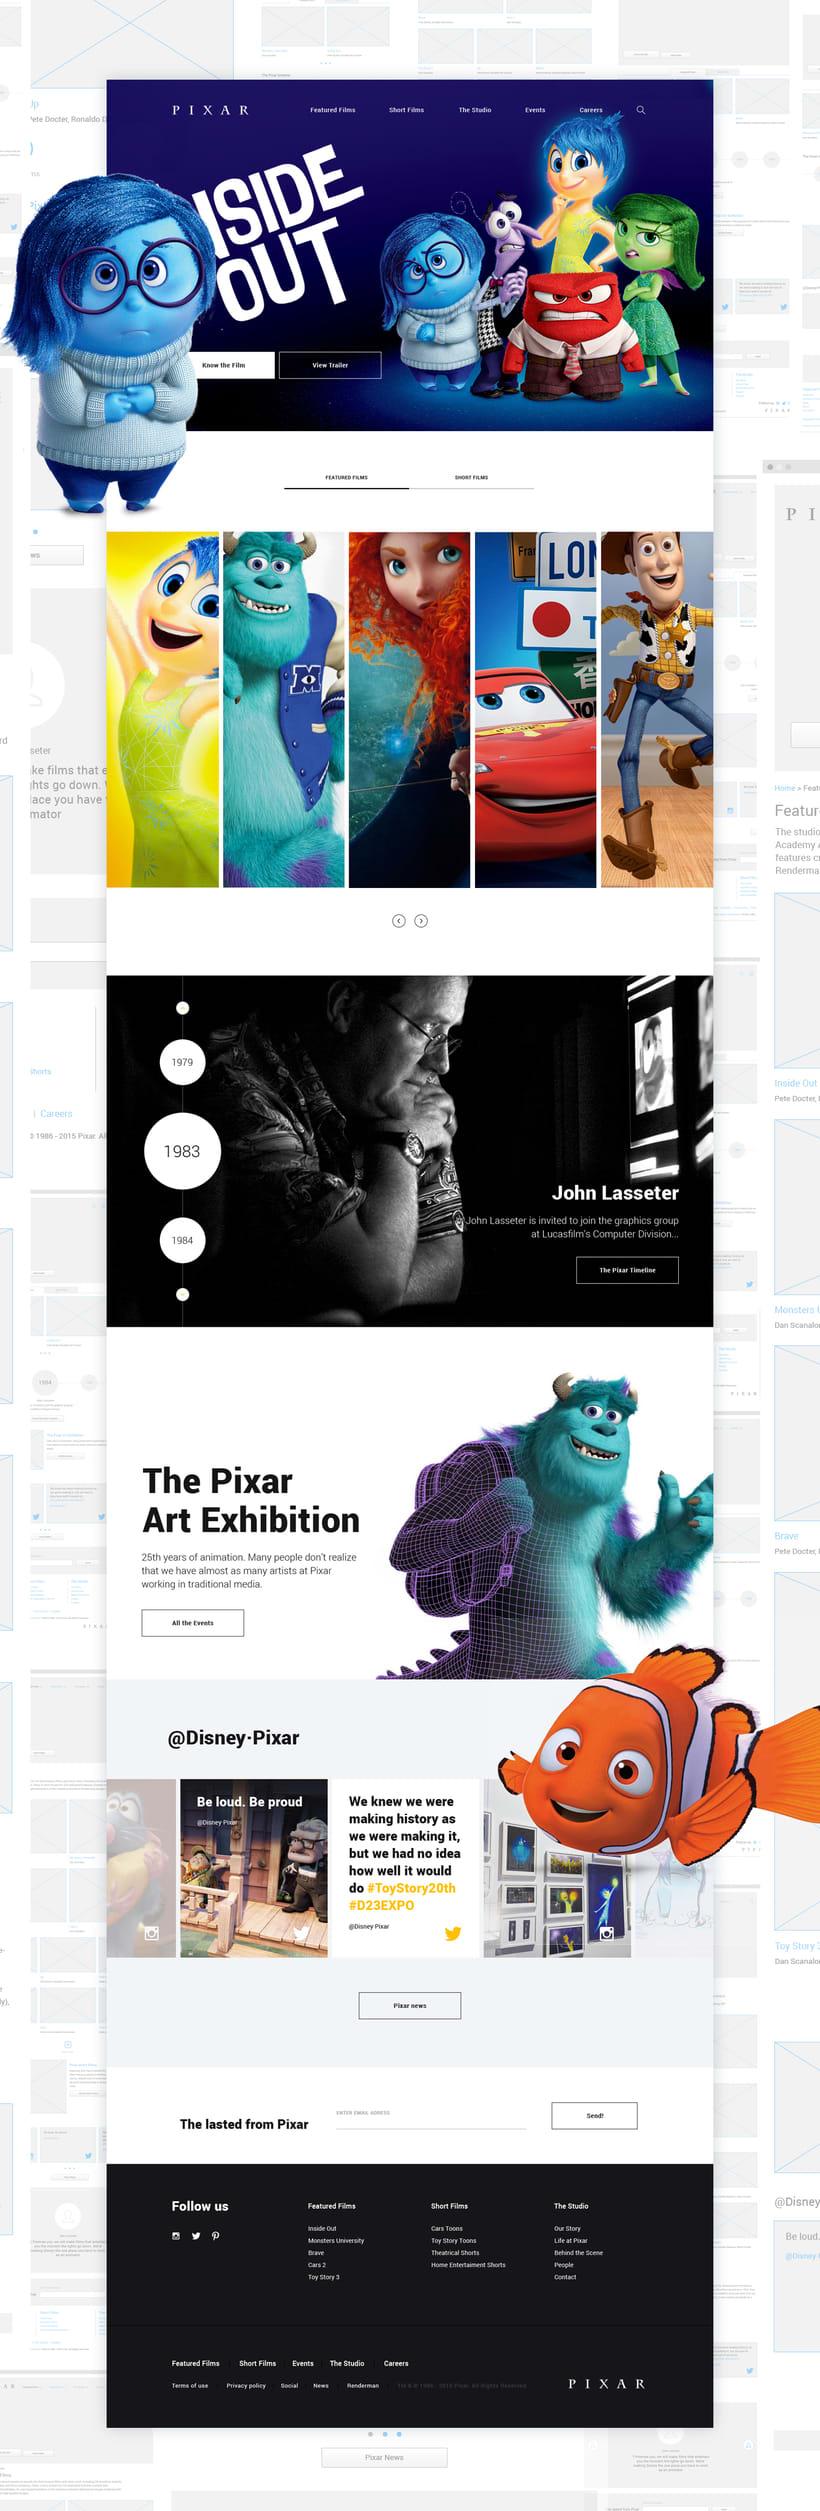 Pixar Redesign Concept 2